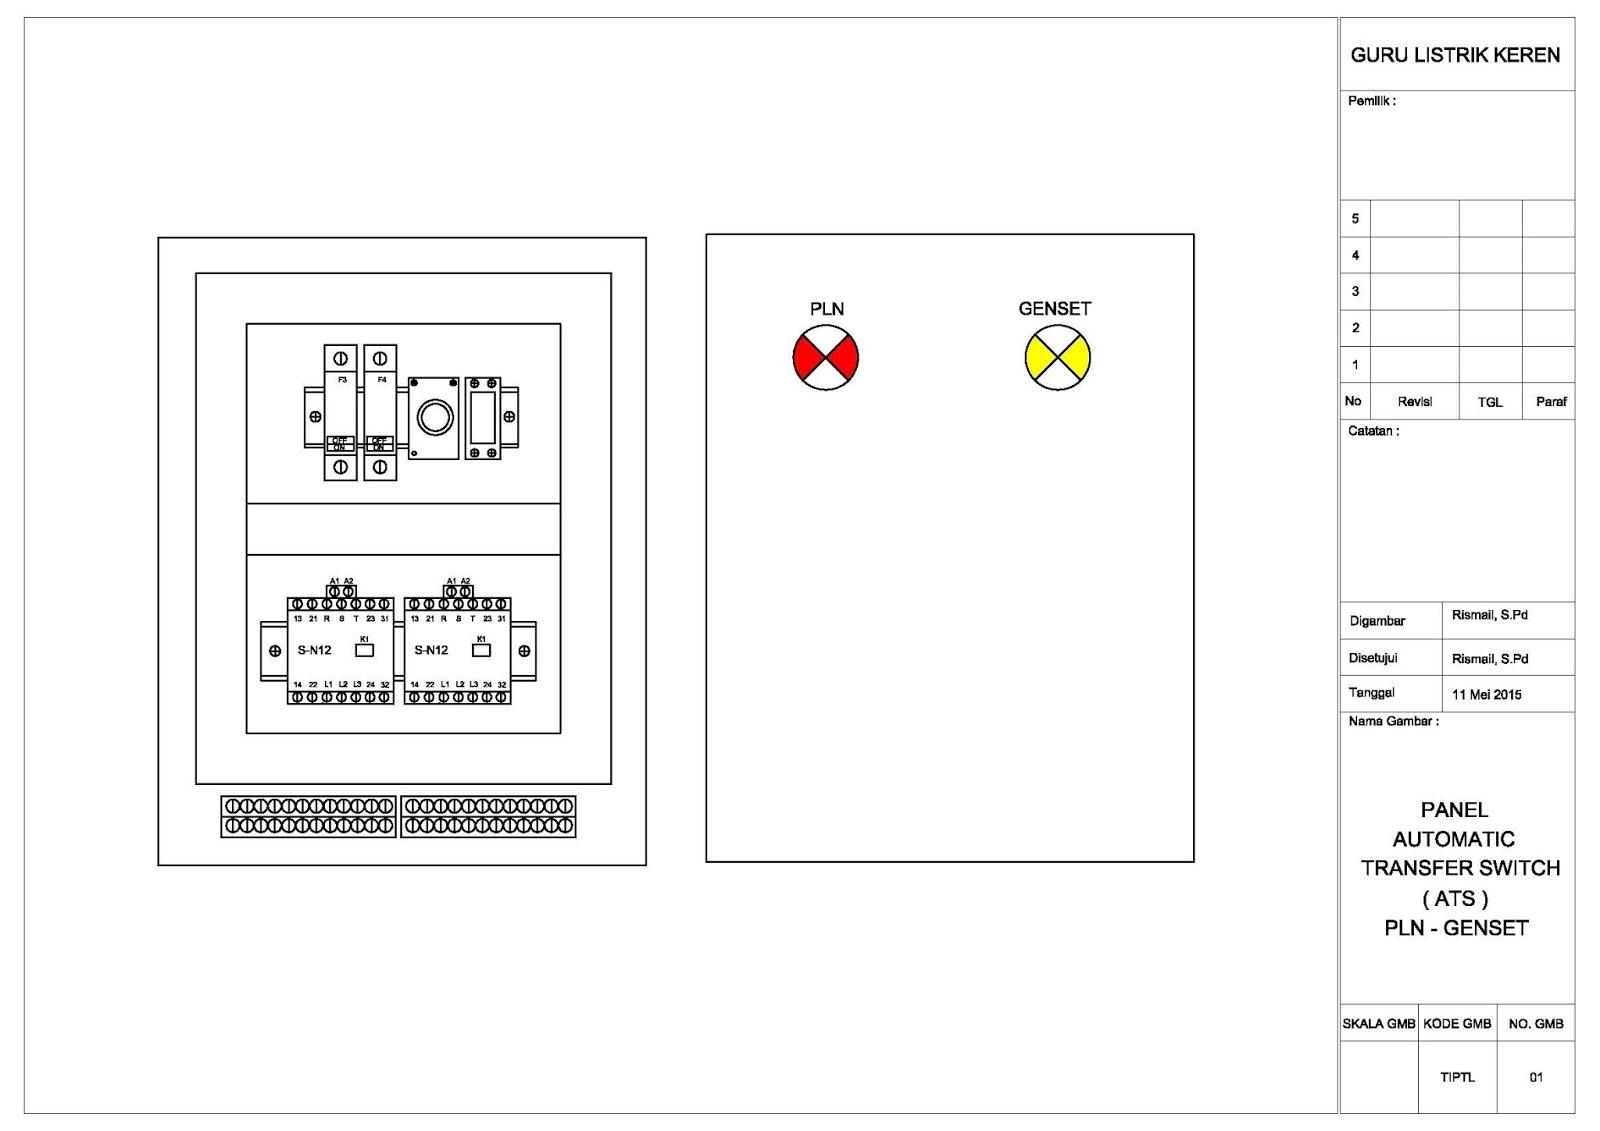 Wiring Ats Sederhana Real Diagram Panel Genset Automatic Transfer Switch Guru Listrik Keren Rh Gurulistrikkeren Blogspot Com Distribution Board